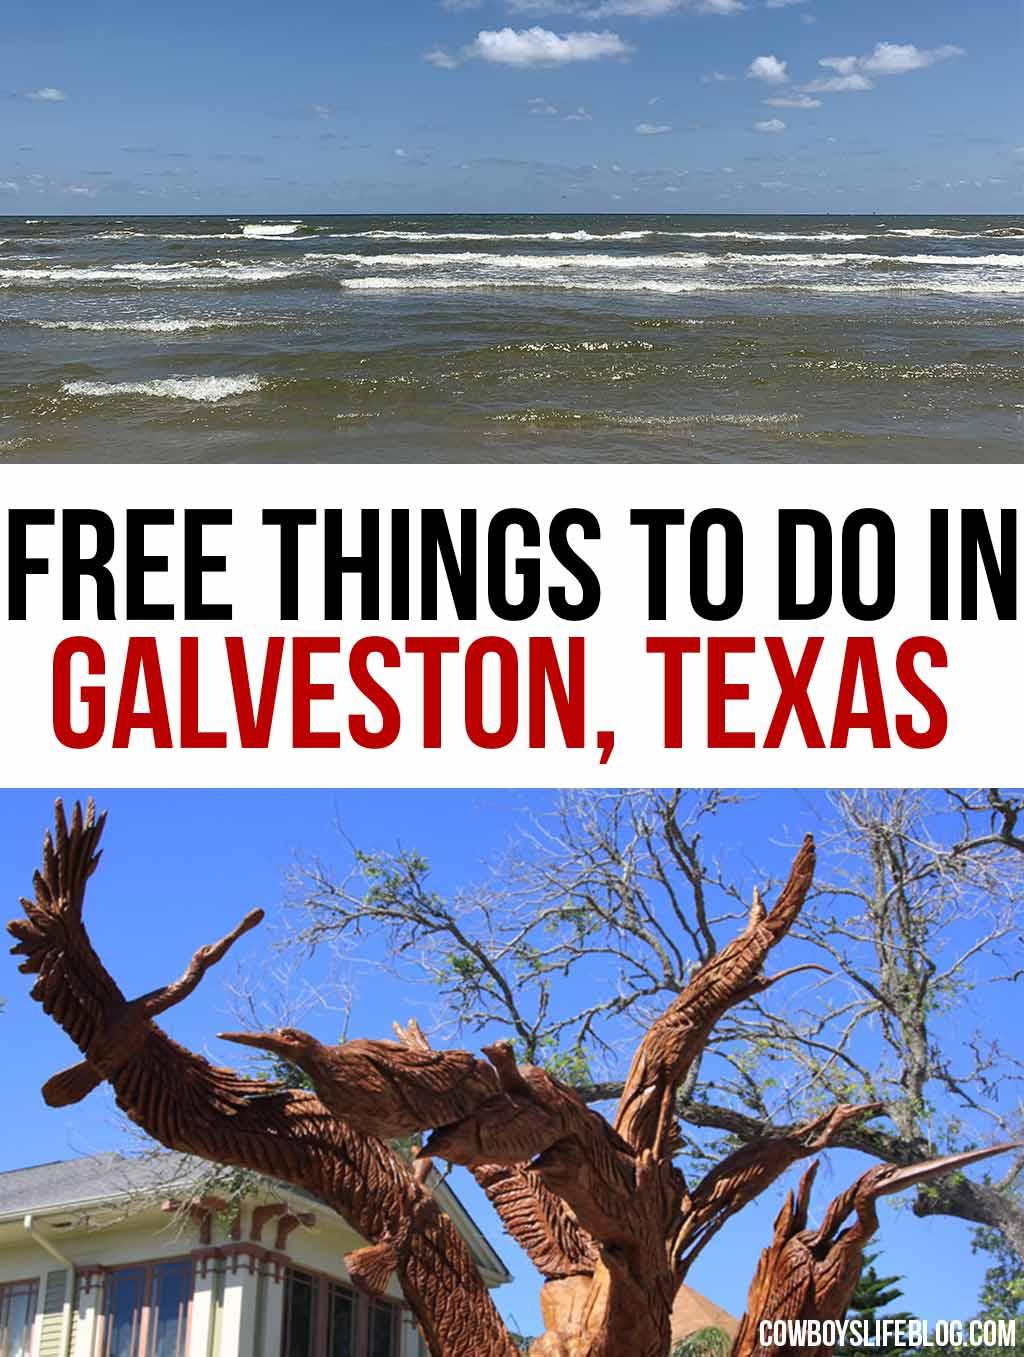 8 Free Things to do in Galveston, Texas